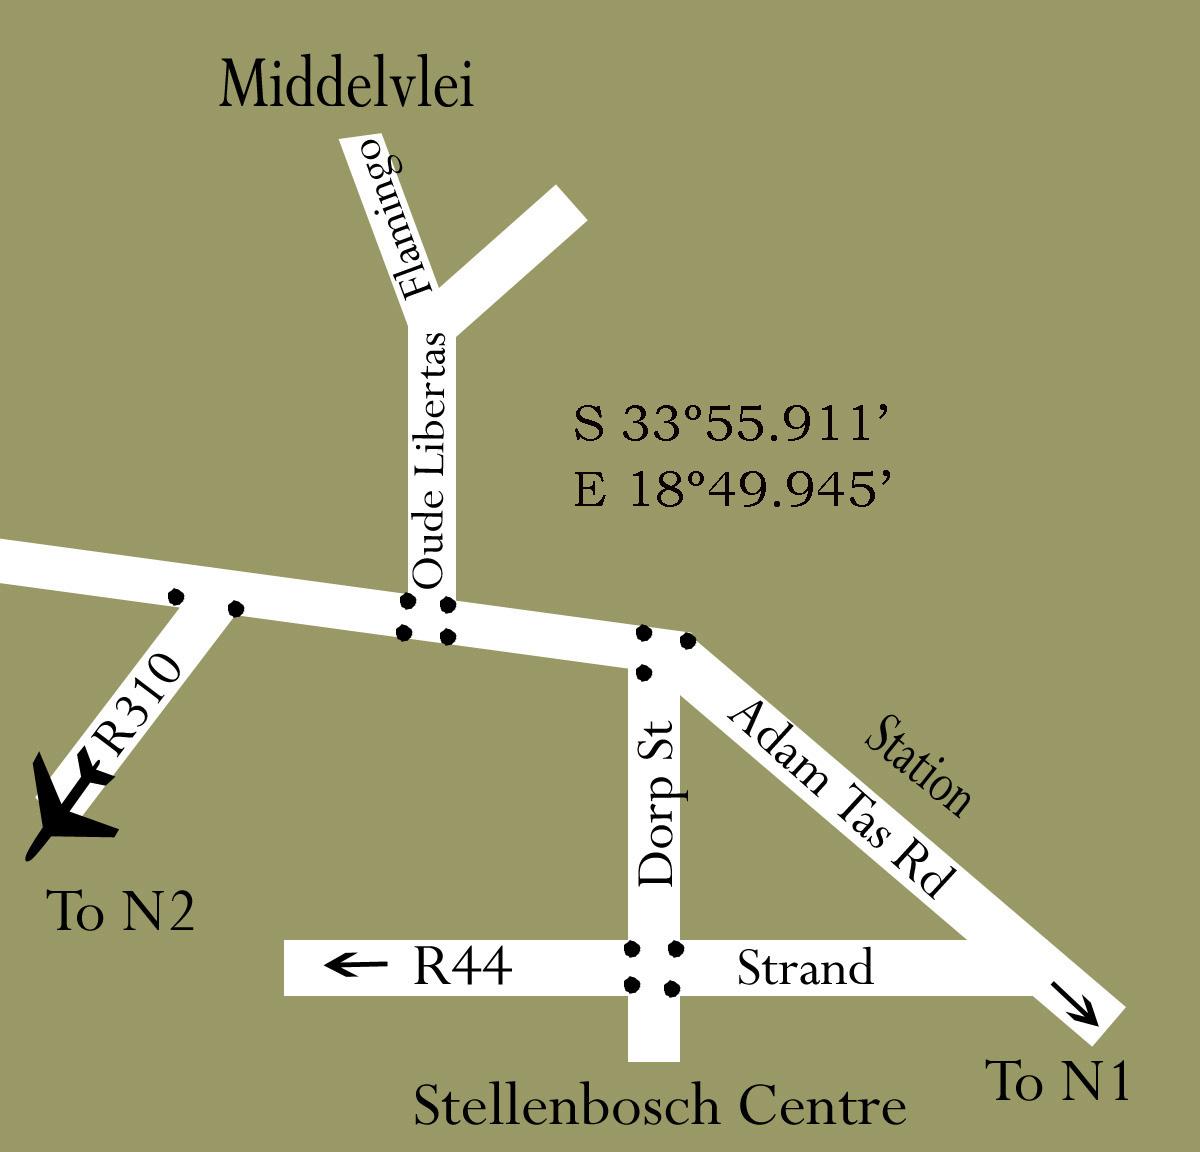 Middelvlei_map